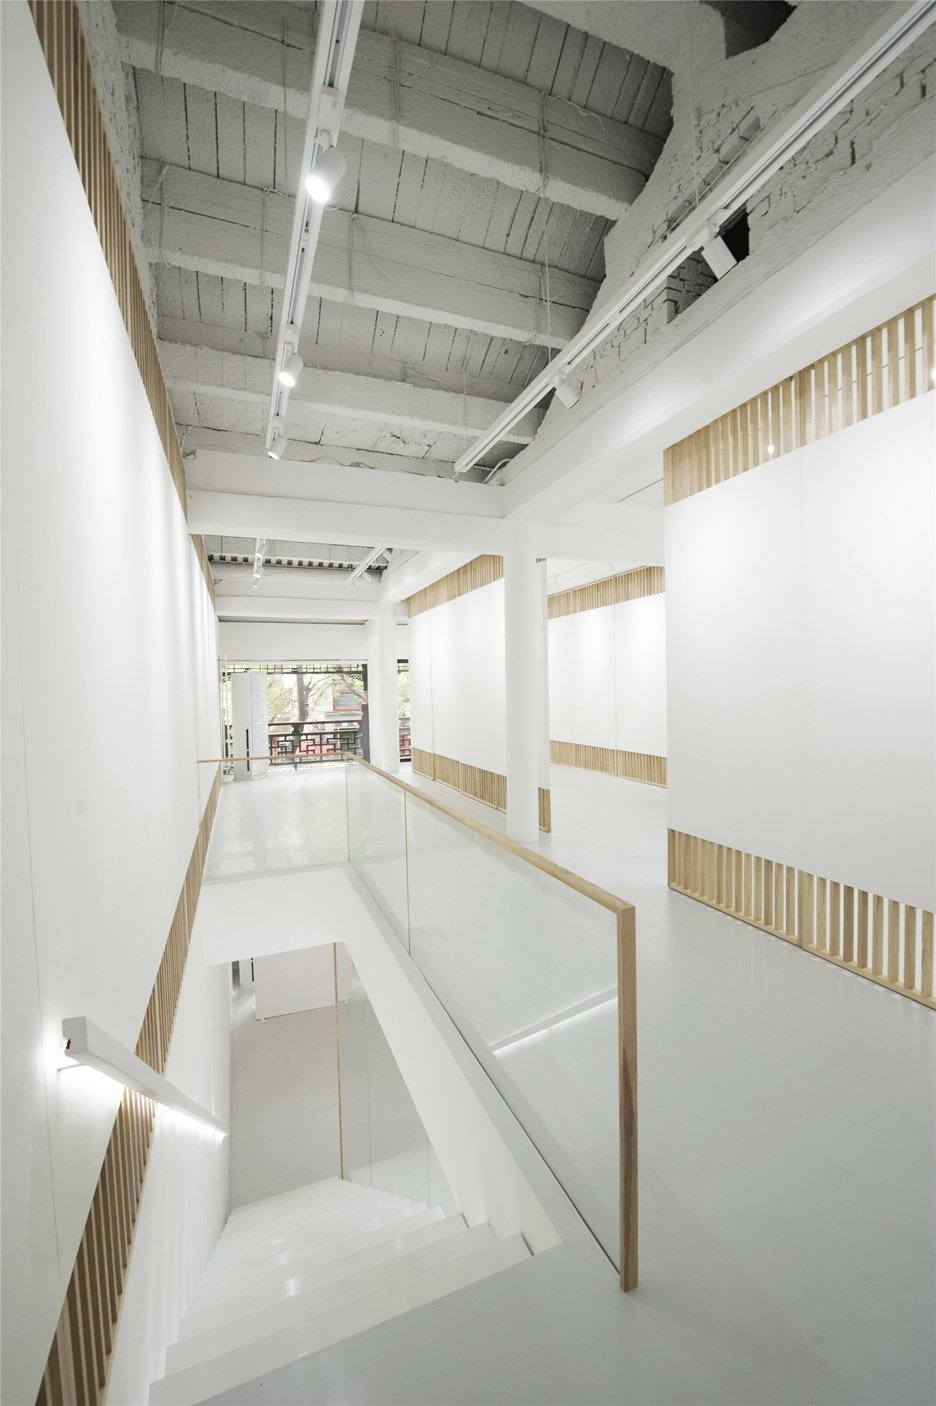 Rongbaozhai Western Art Gallery by Arch Studio